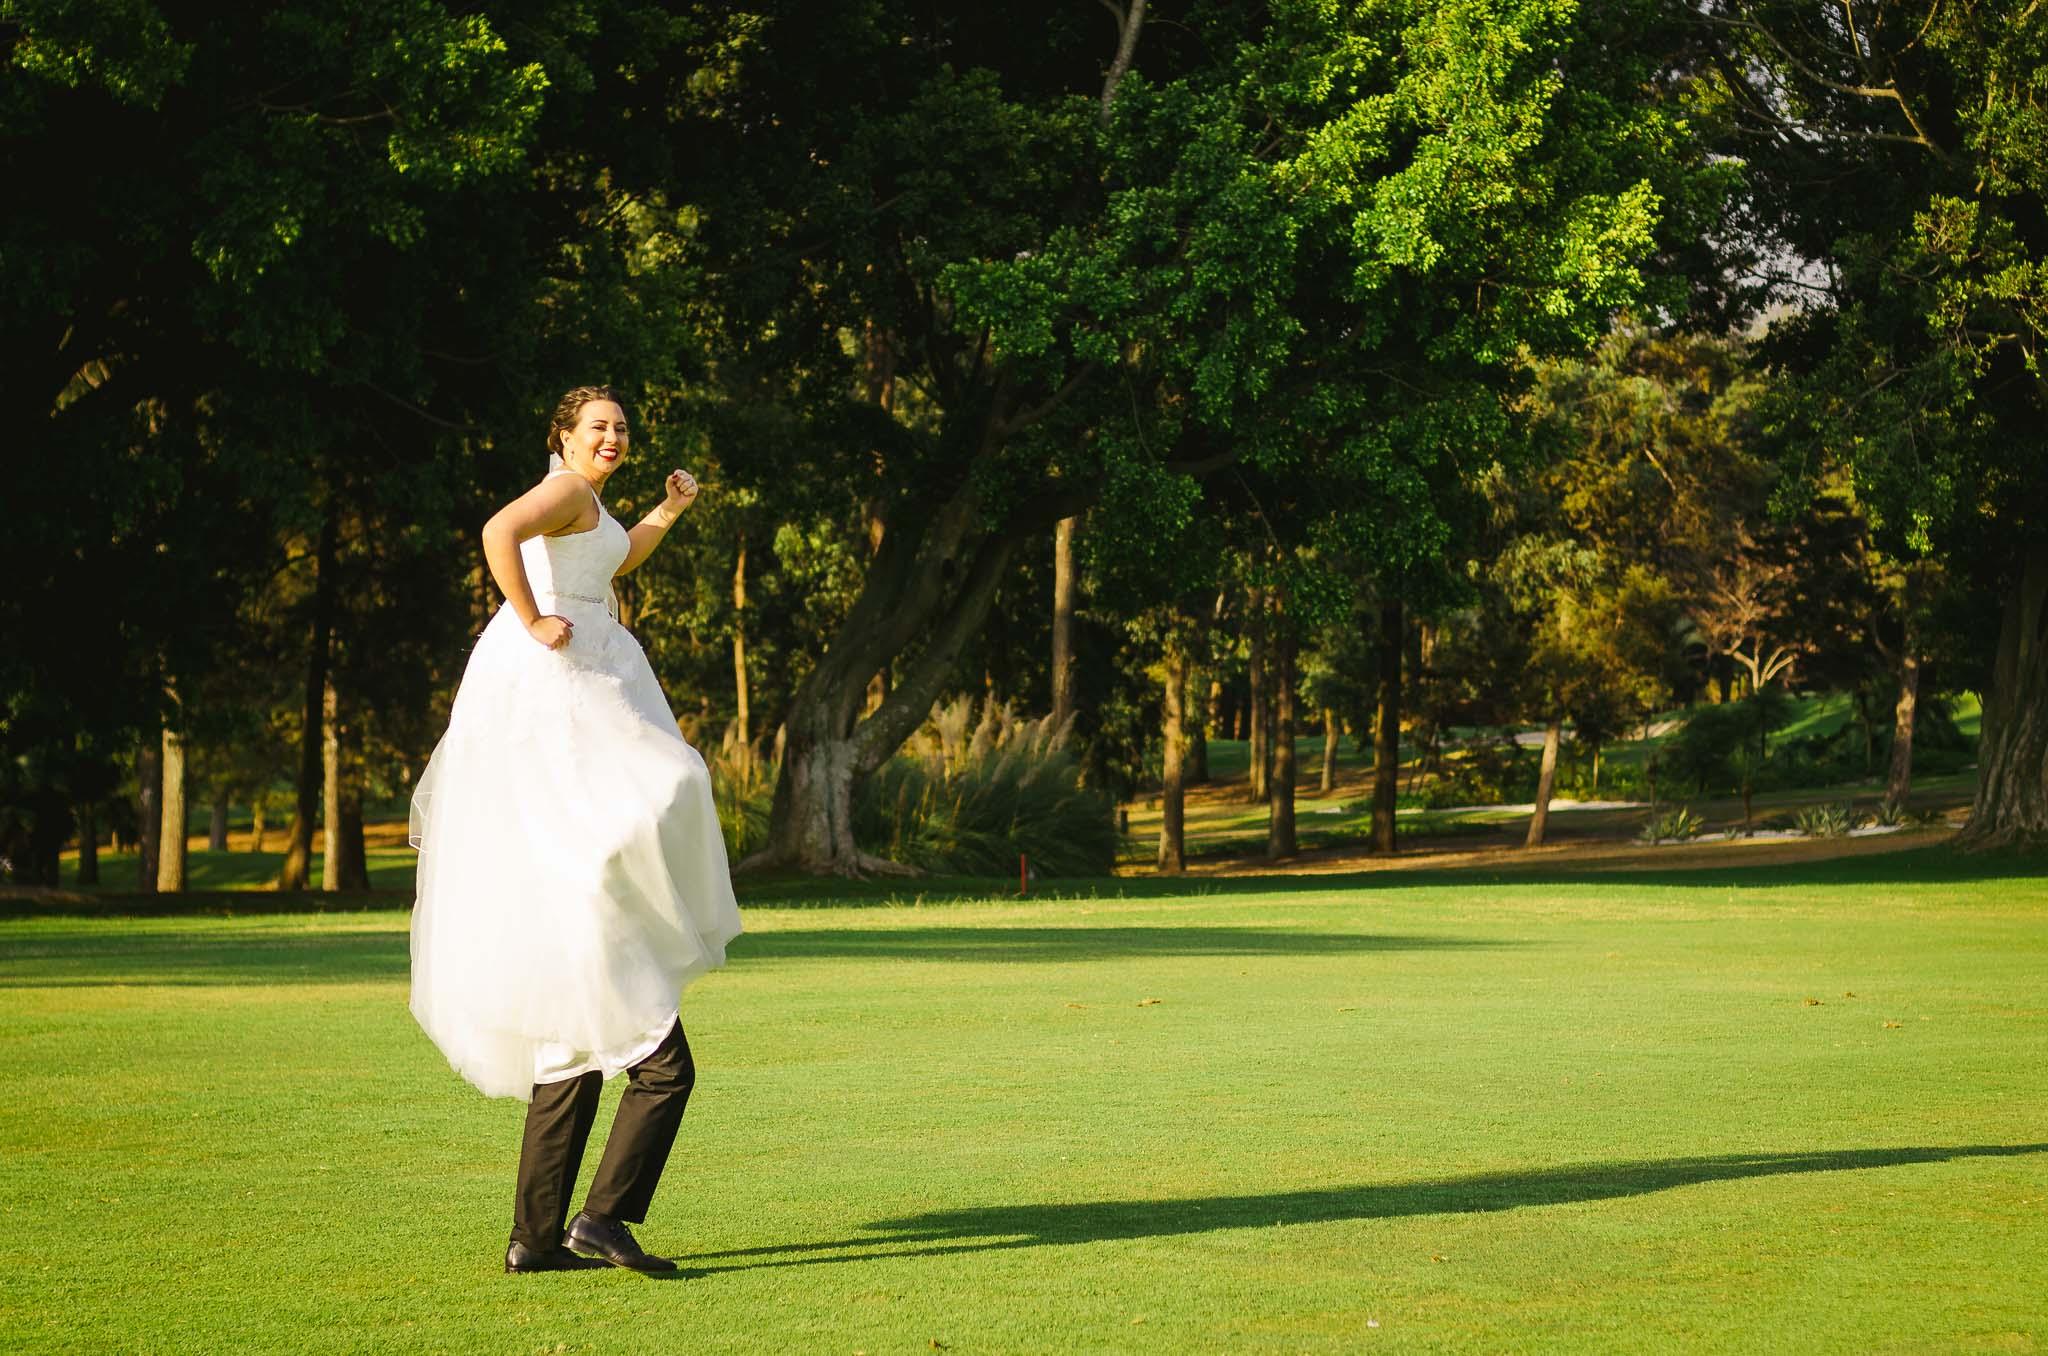 Postboda-Pancho_Luisa-Mayan_Golf_Club-bodas-juan-salazar-fotografo-Guatemala-Lake-Amatiltan-boda-juansalazarphoto-campo_de_golf